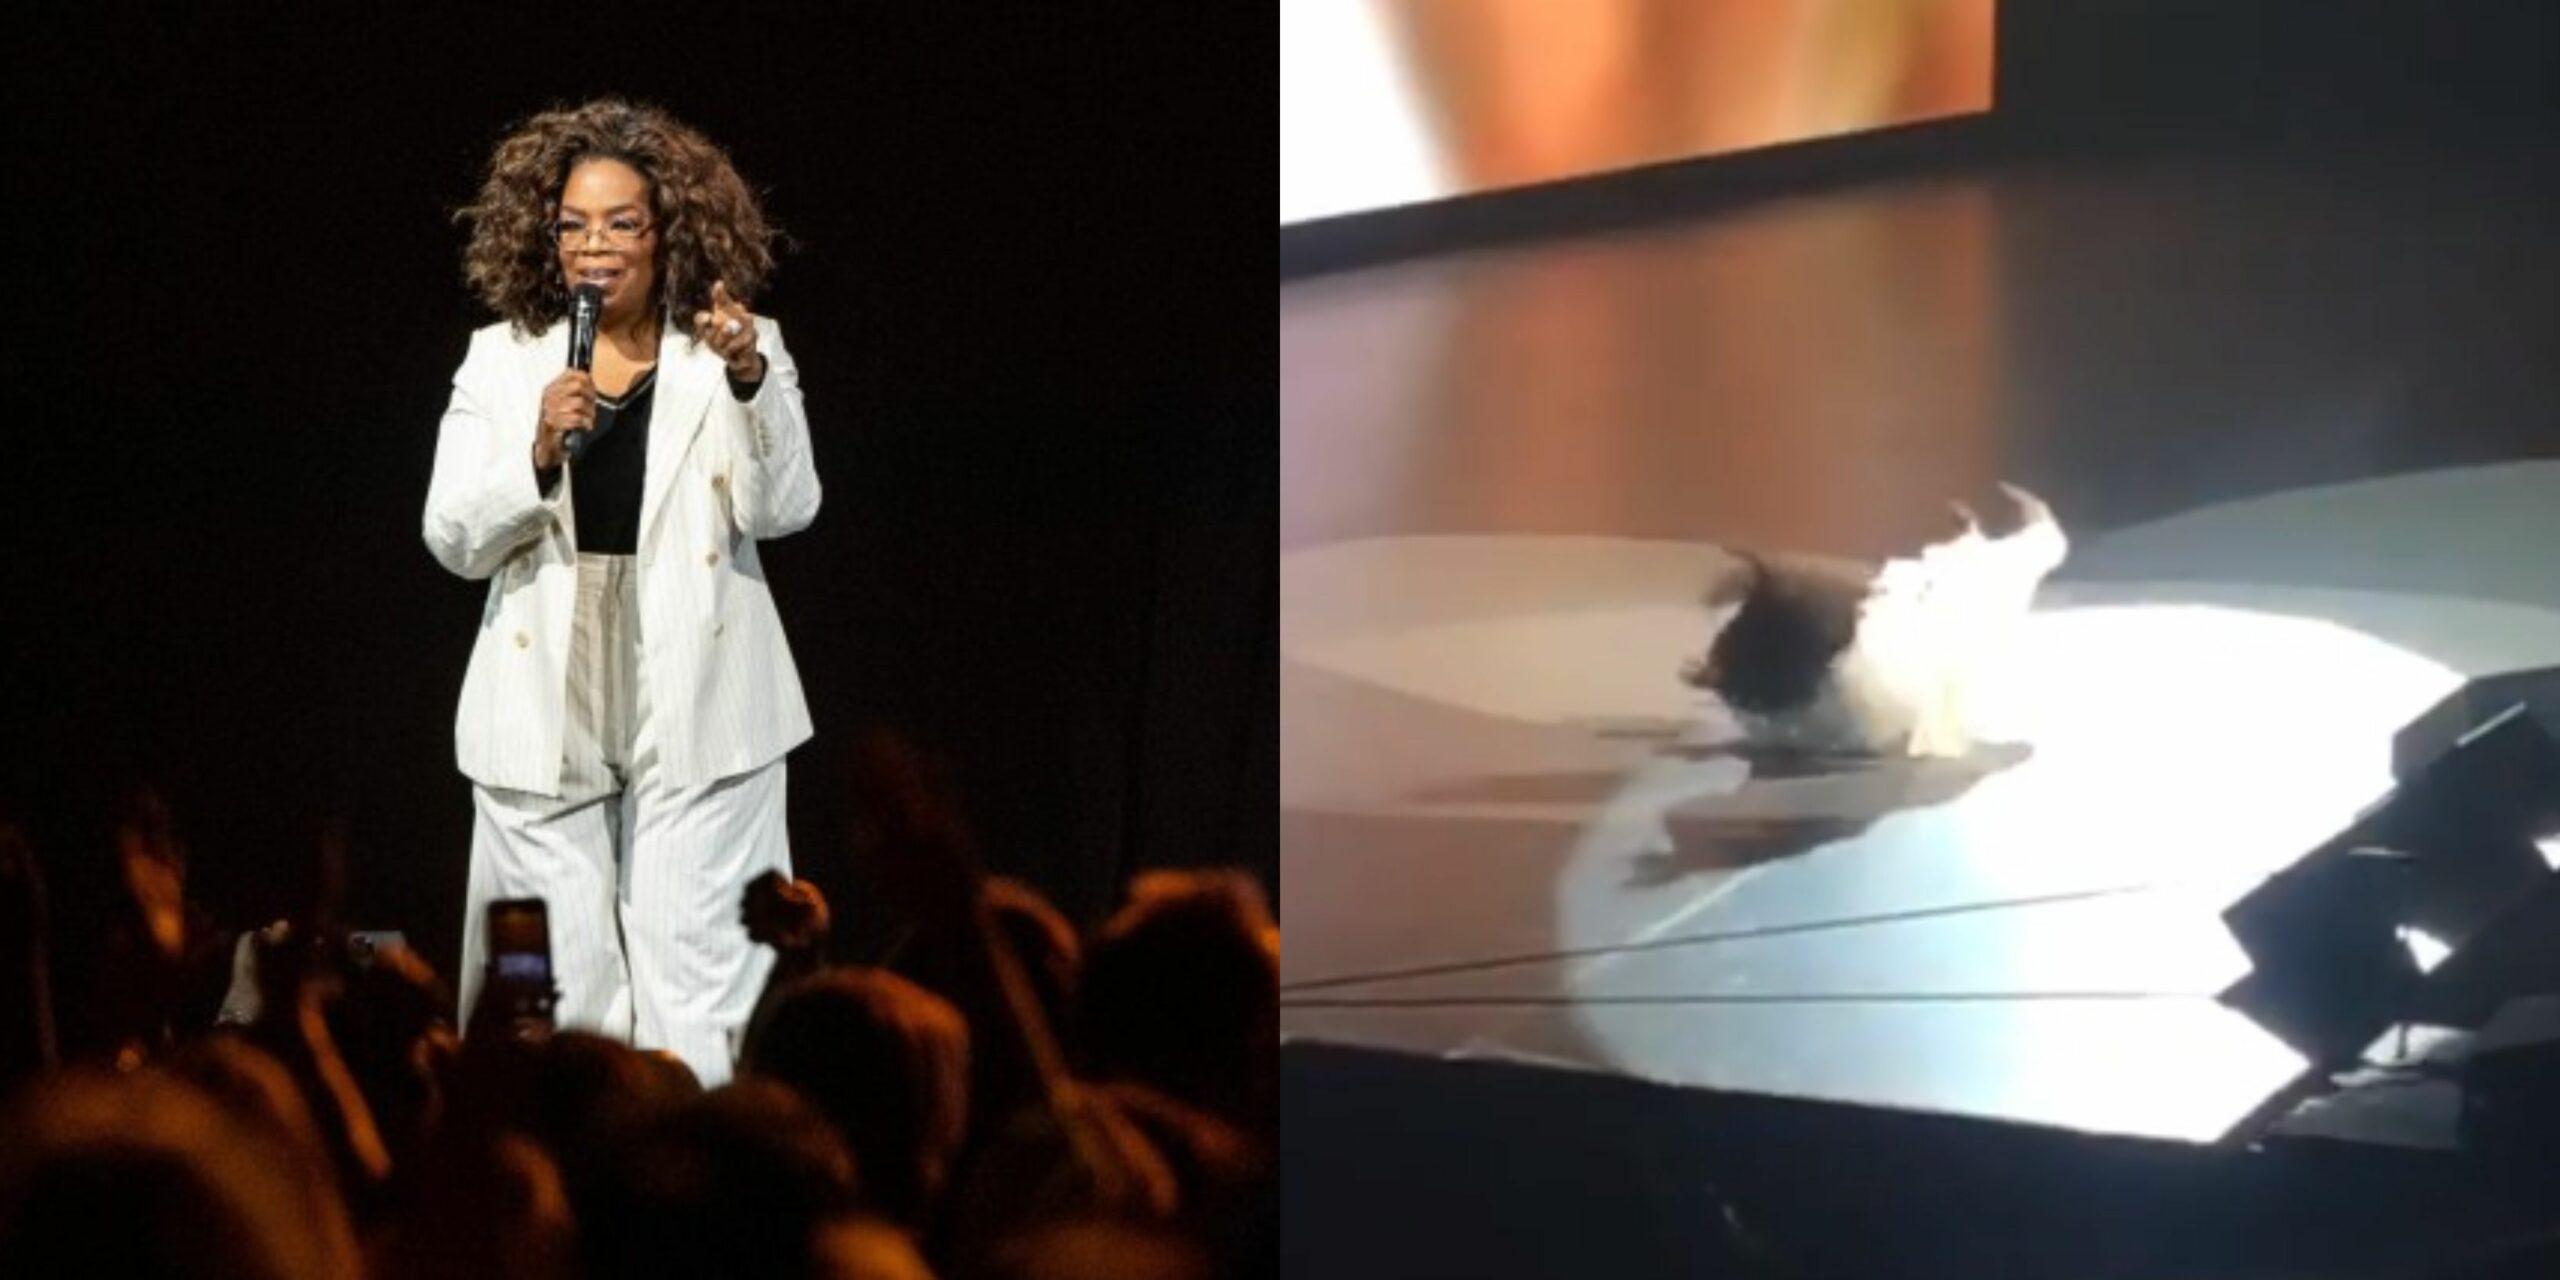 Ironic! Billionaire Oprah Winfrey stumbles and falls hard on stage while talking about balance